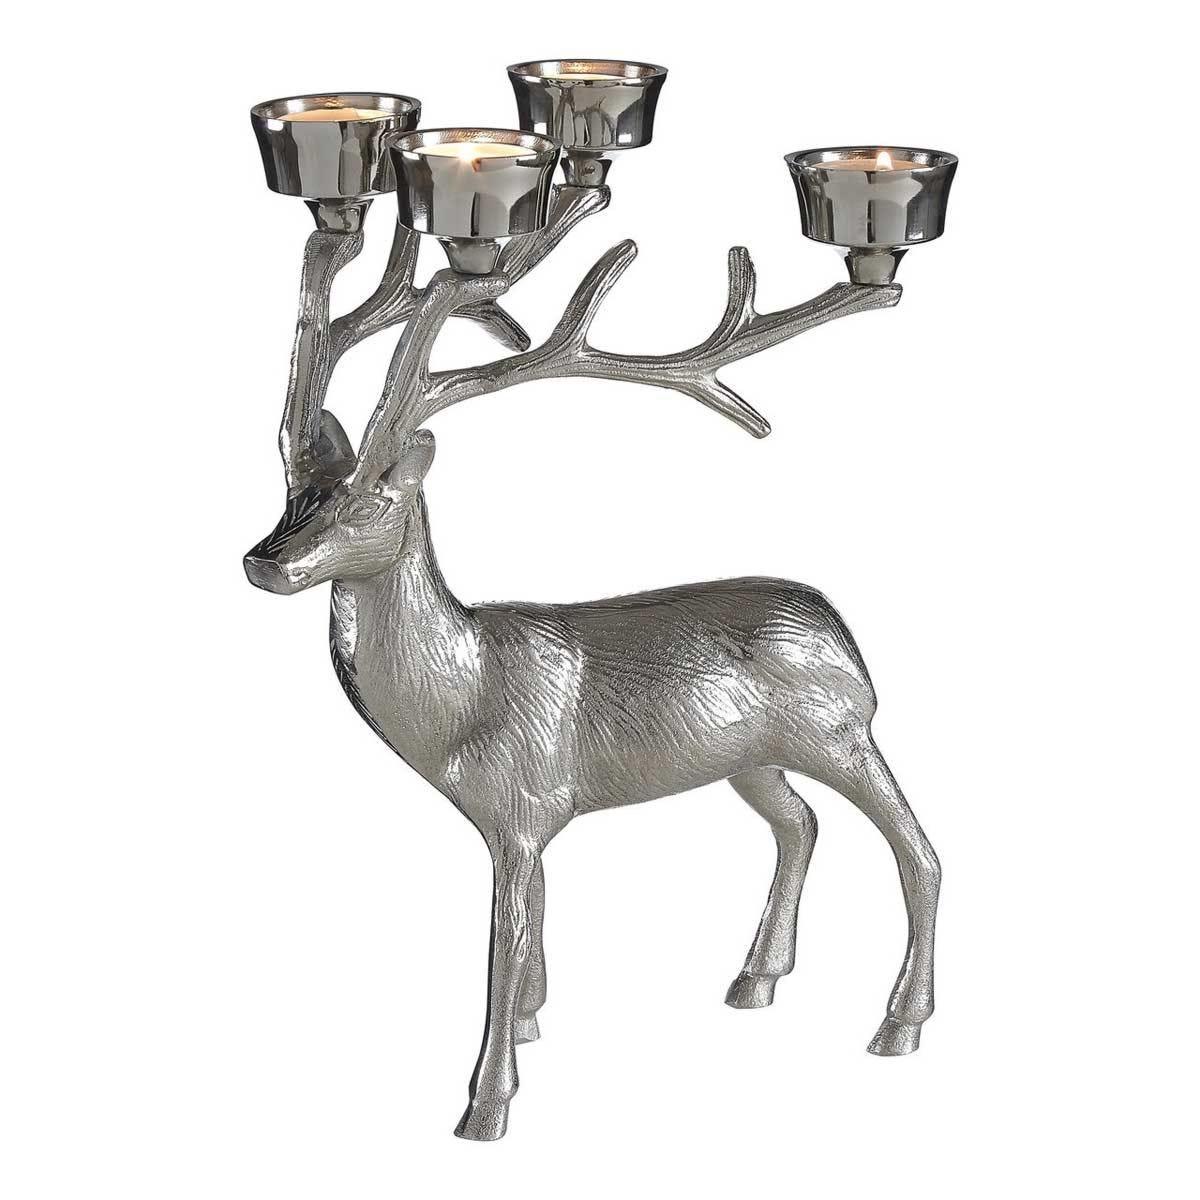 Premier Housewares Stag Tealight Holder - Nickel Finish